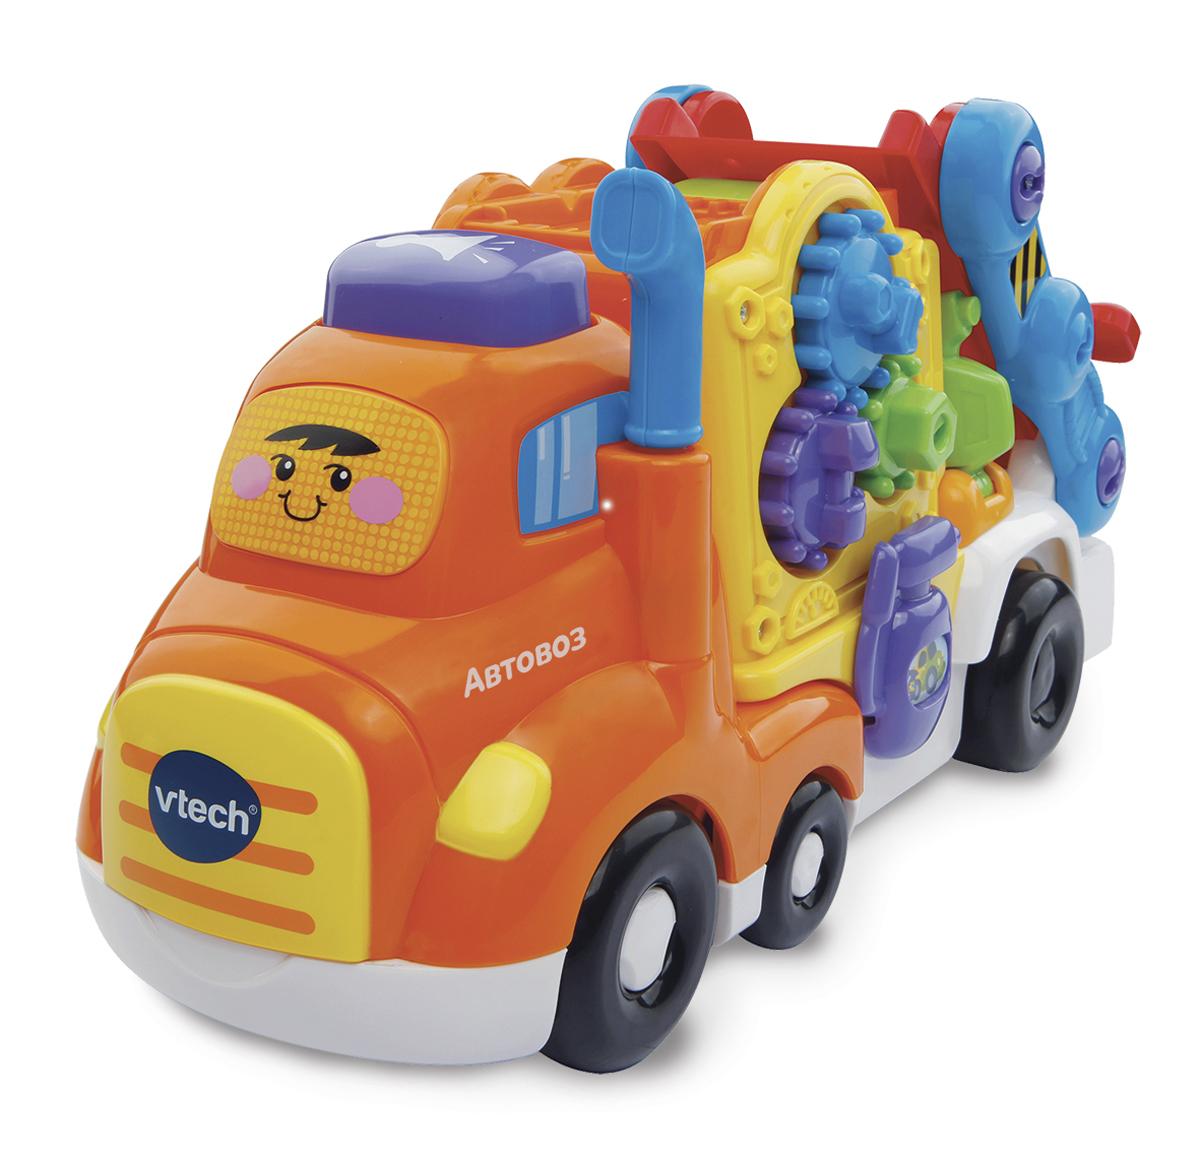 Vtech Бип-Бип Toot-Toot Drivers Автовоз игрушка vtech бип бип бульдозер 80 151826